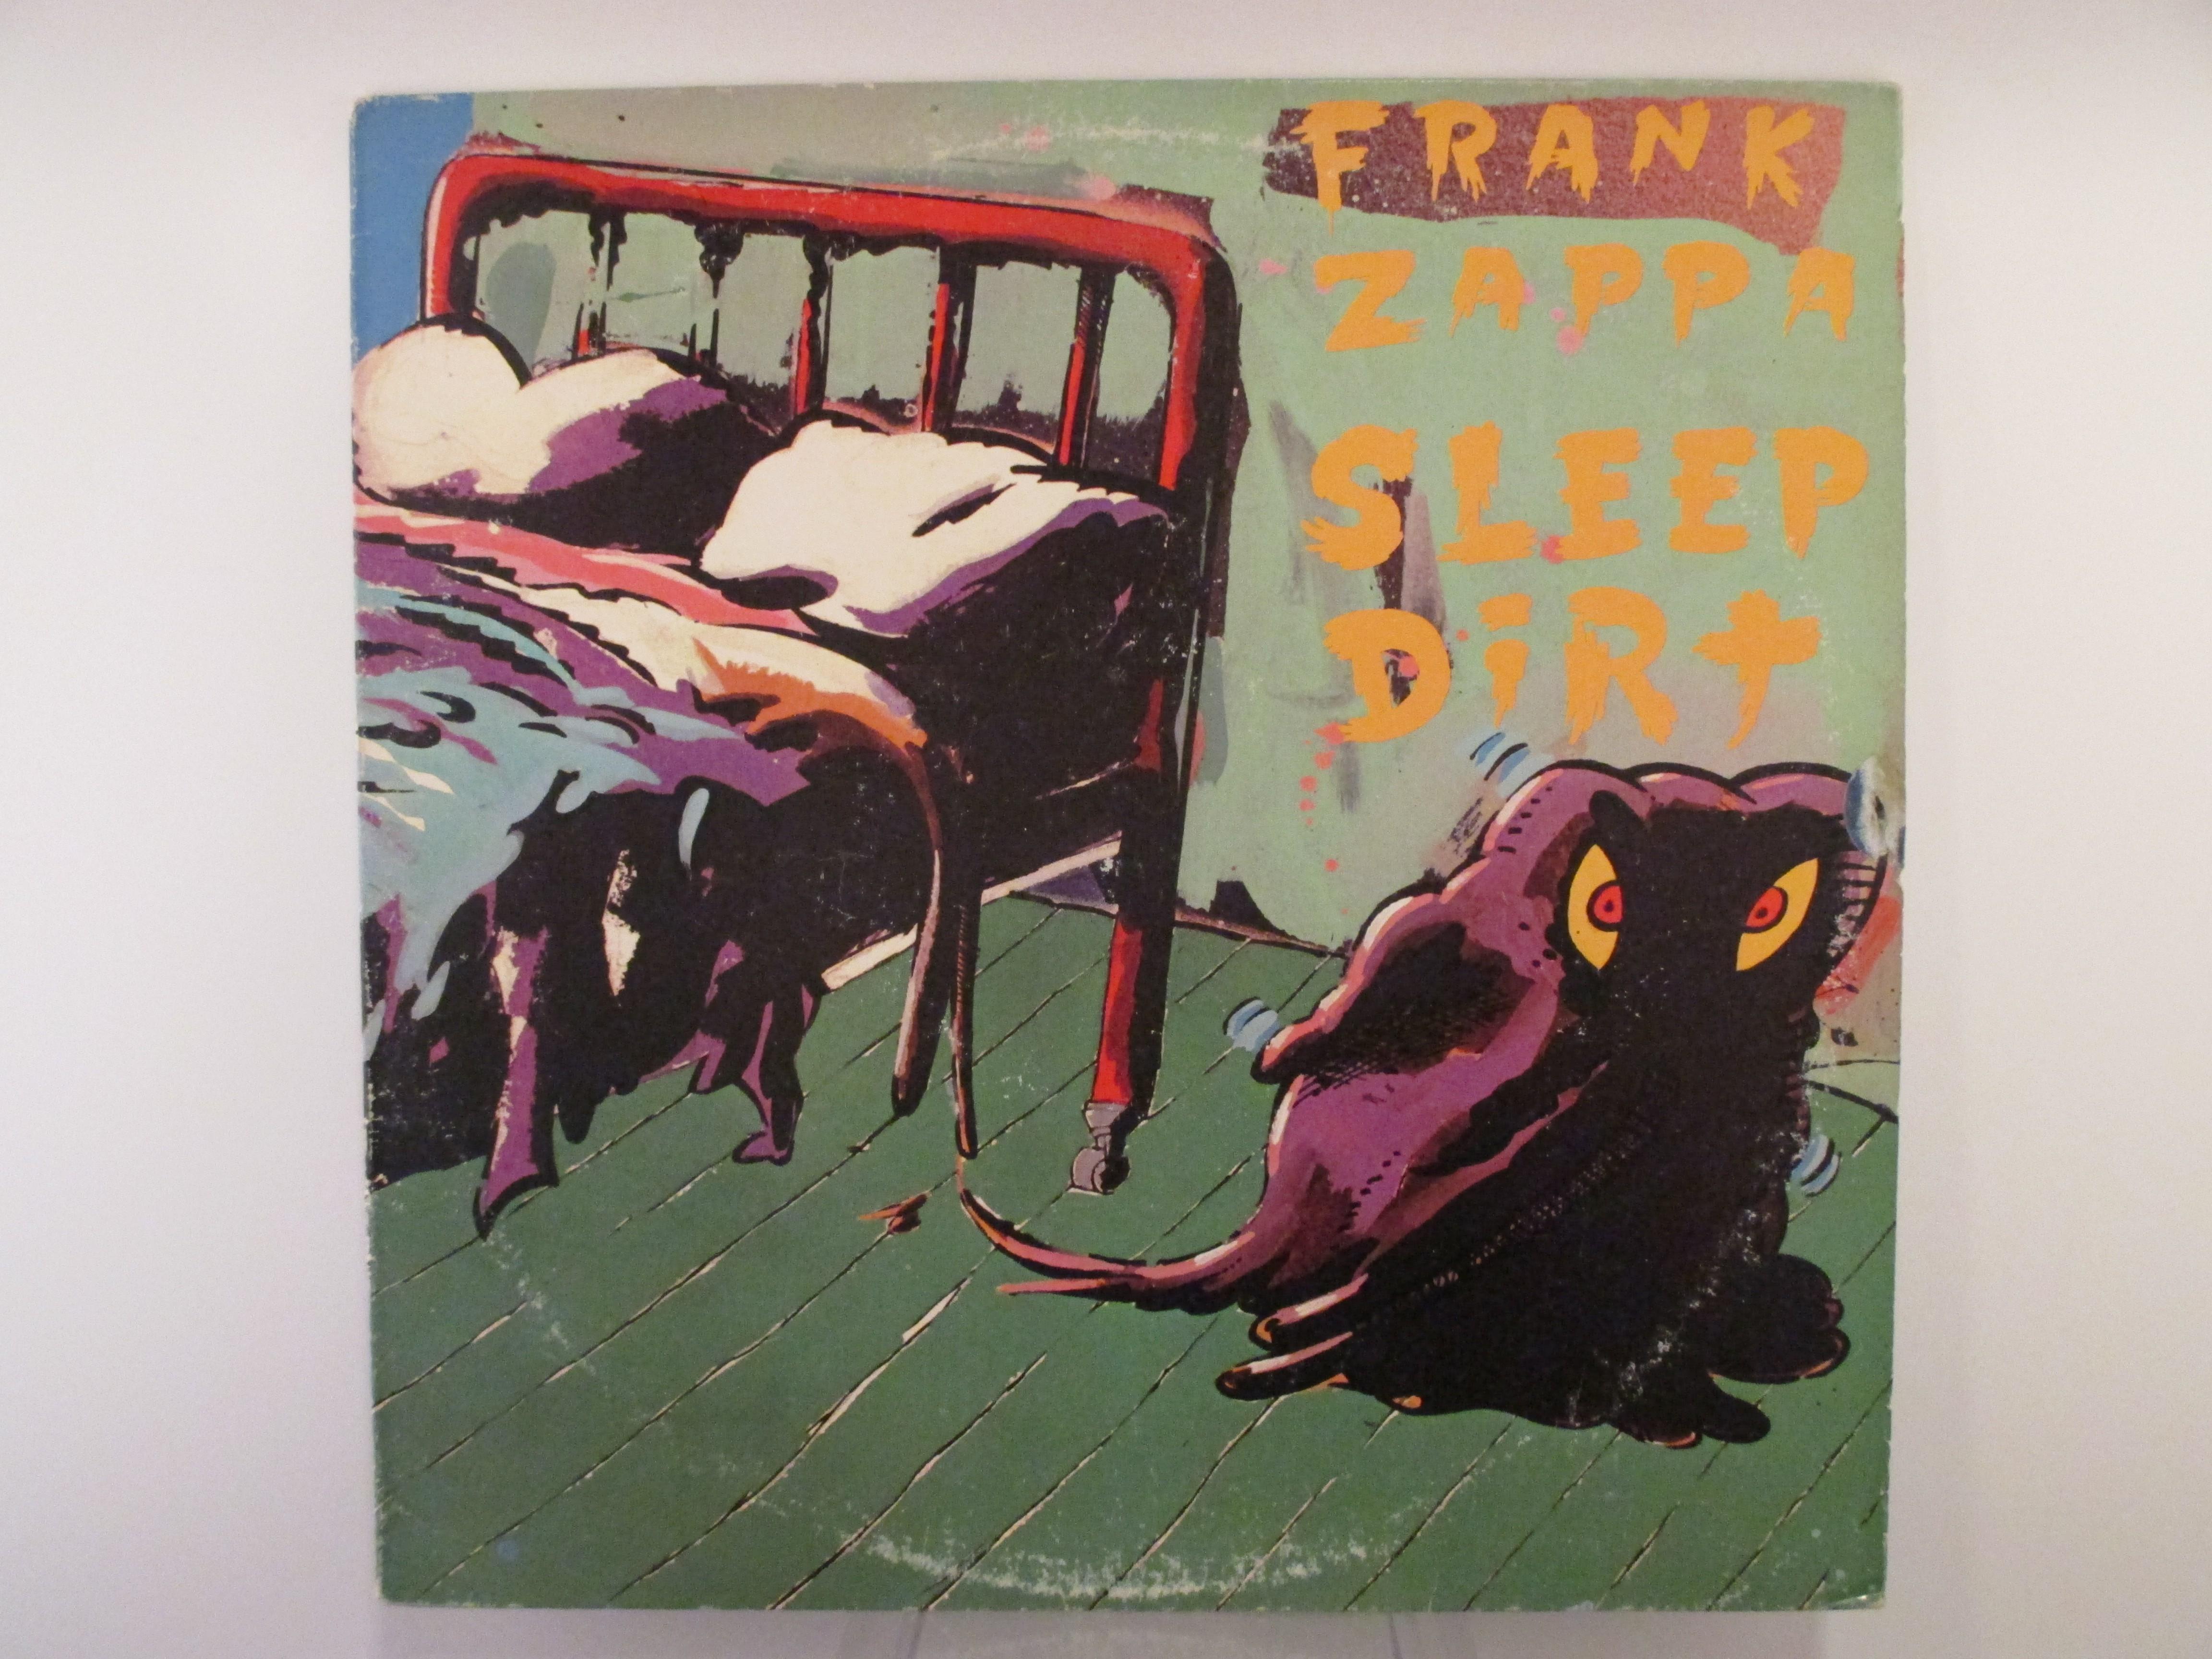 Frank Zappa Sleep Dirt